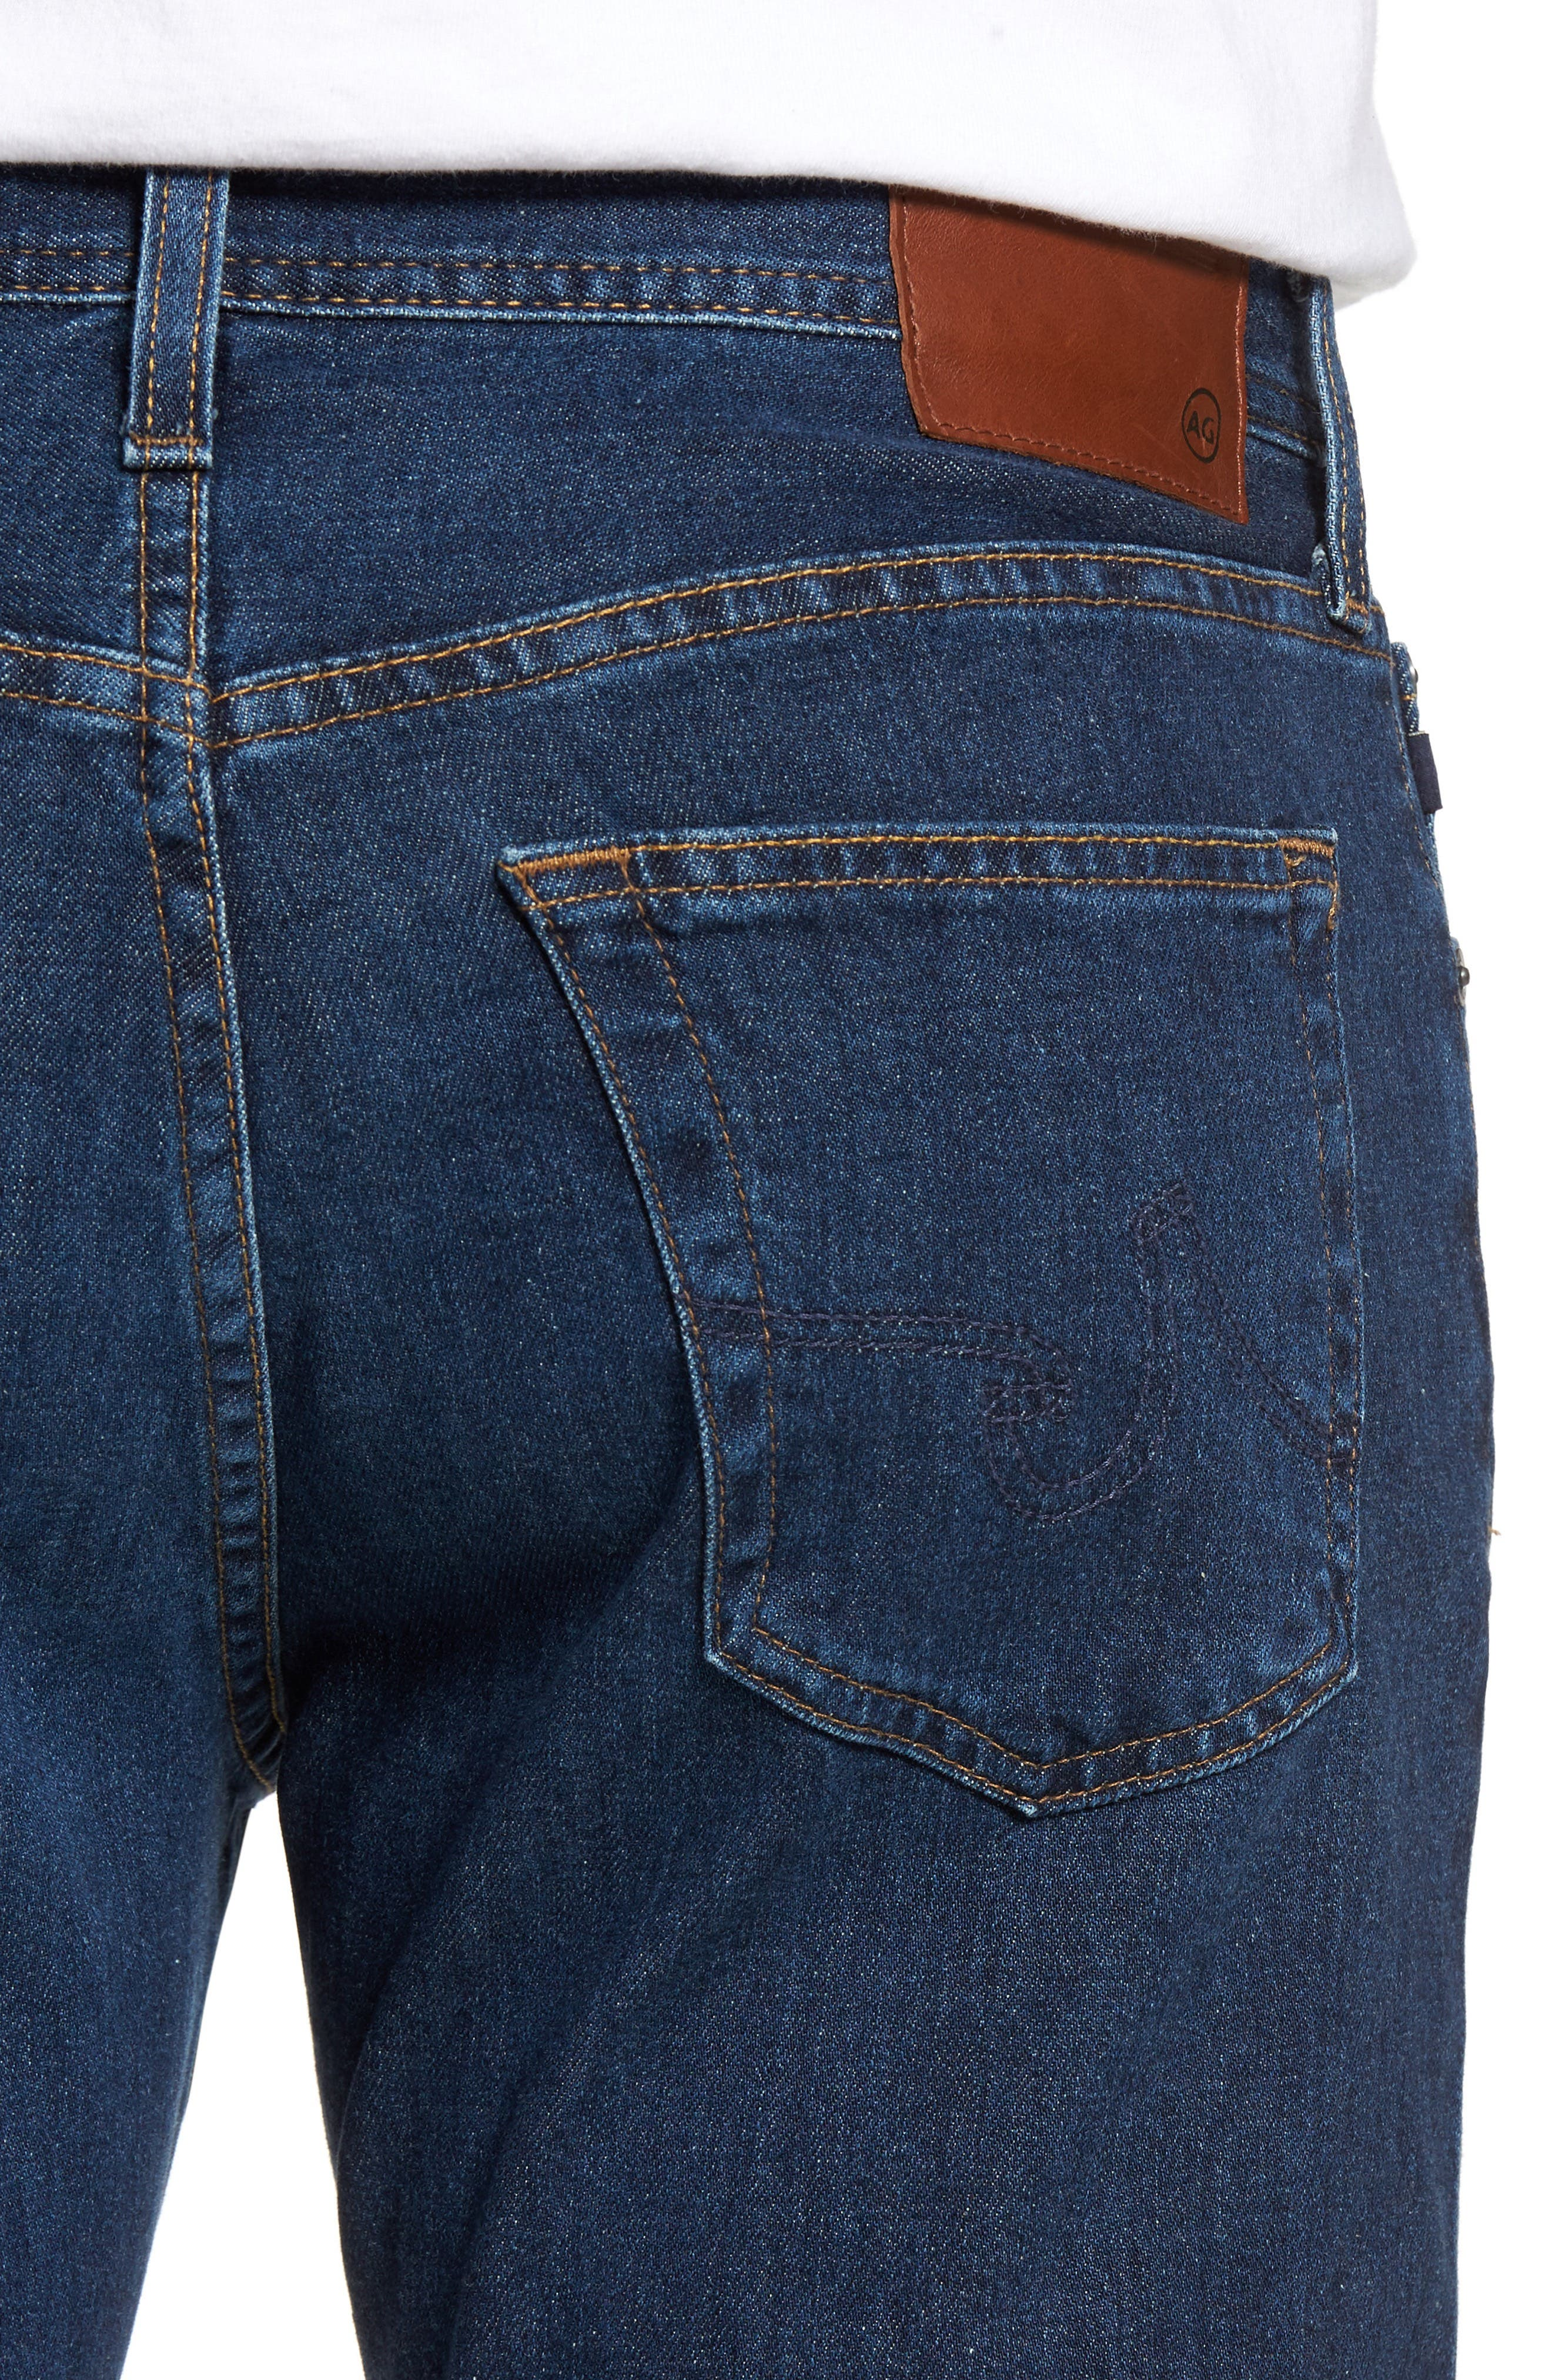 Graduate Slim Straight Leg Jeans,                             Alternate thumbnail 4, color,                             435